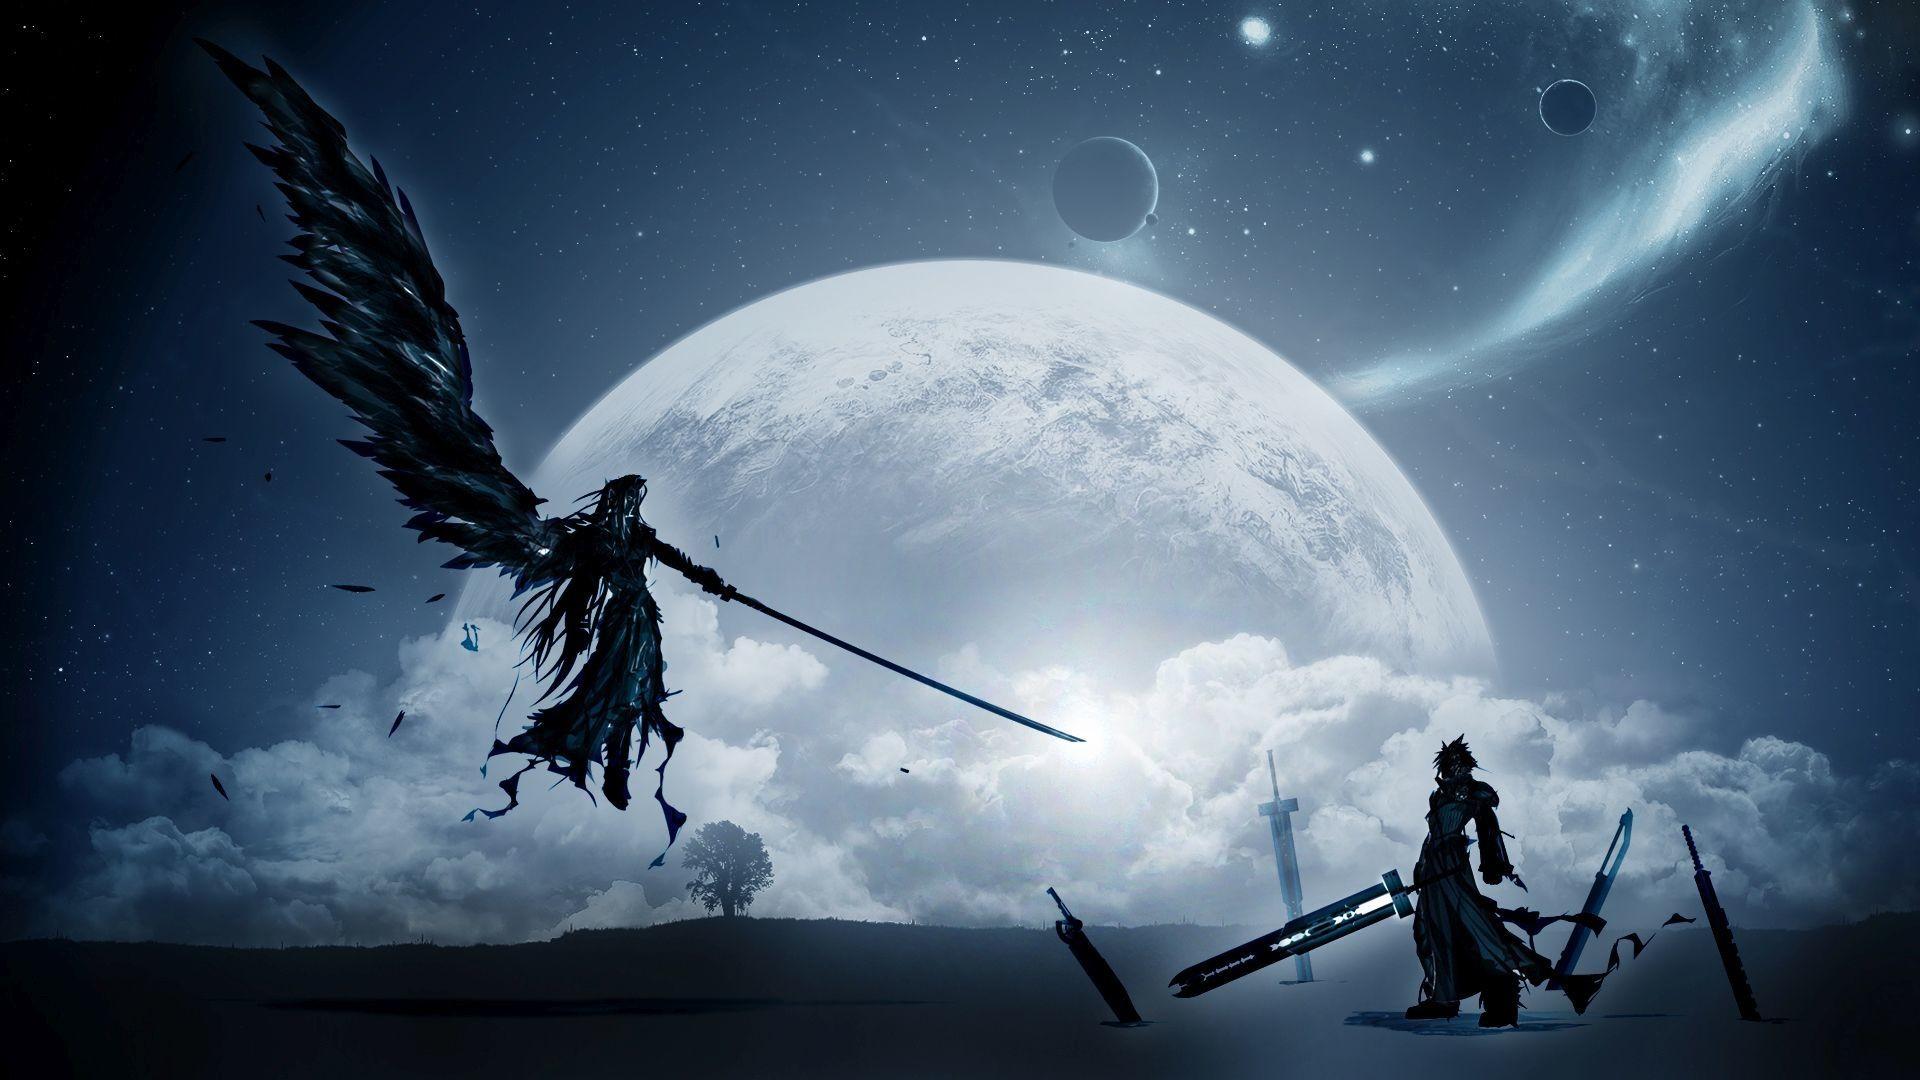 Final Fantasy Wallpaper 1080p 75 Images